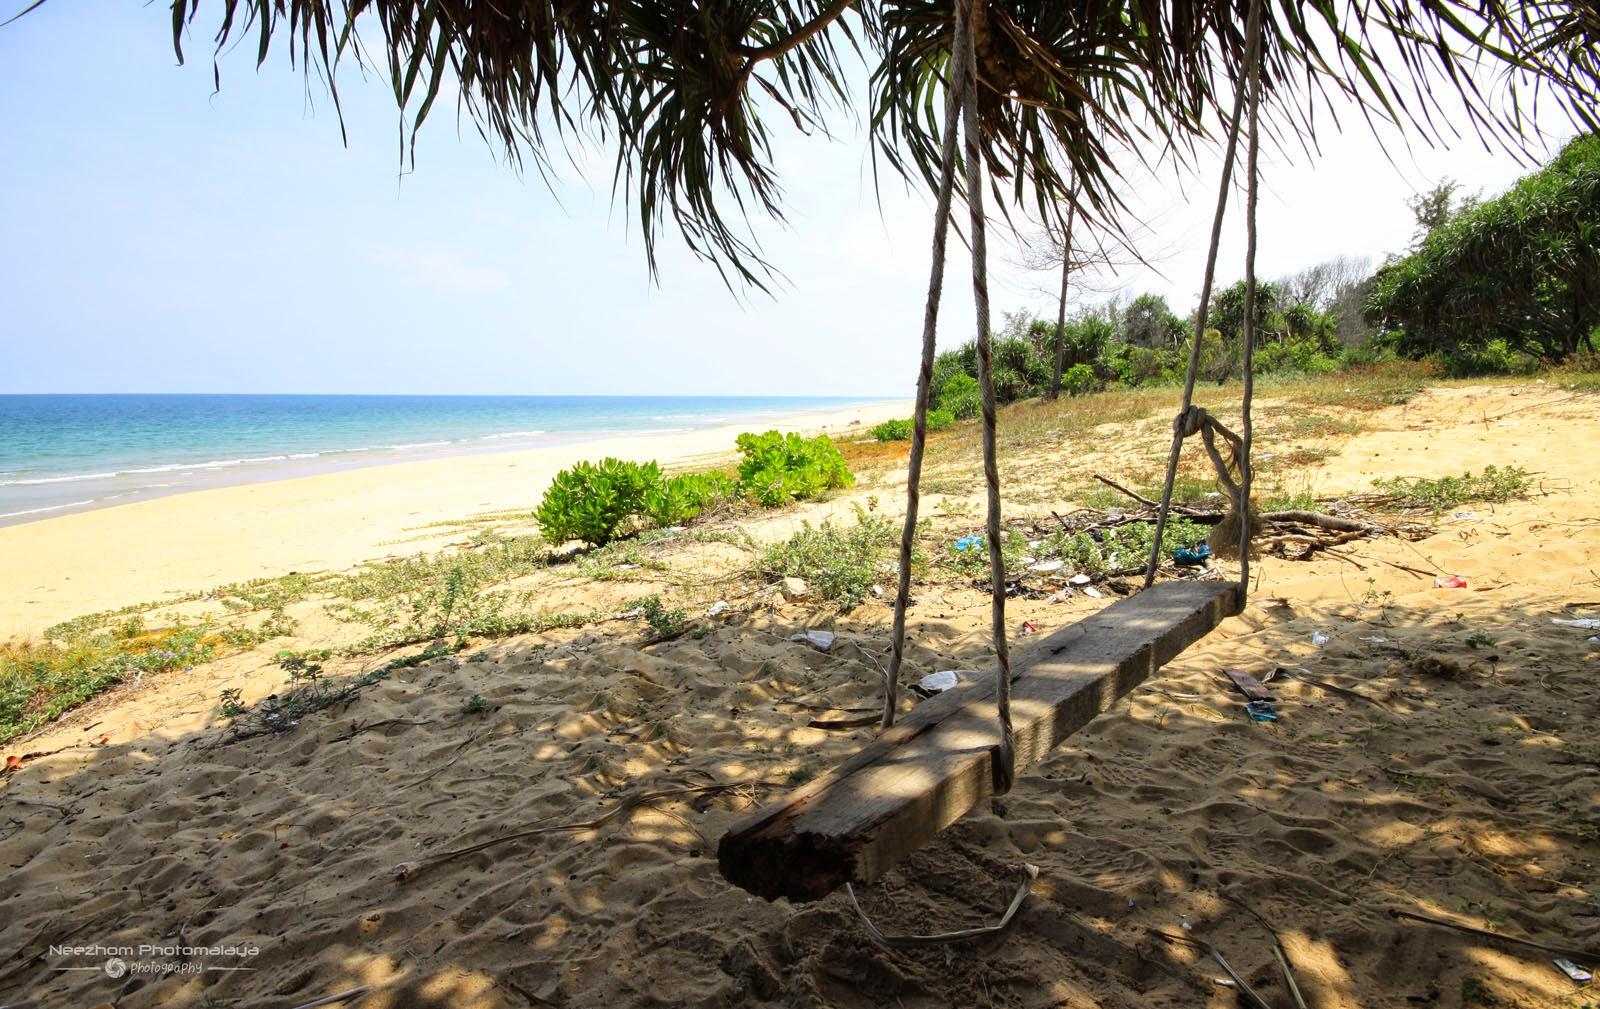 Buaian di Pantai Tanjung Jara, Dungun